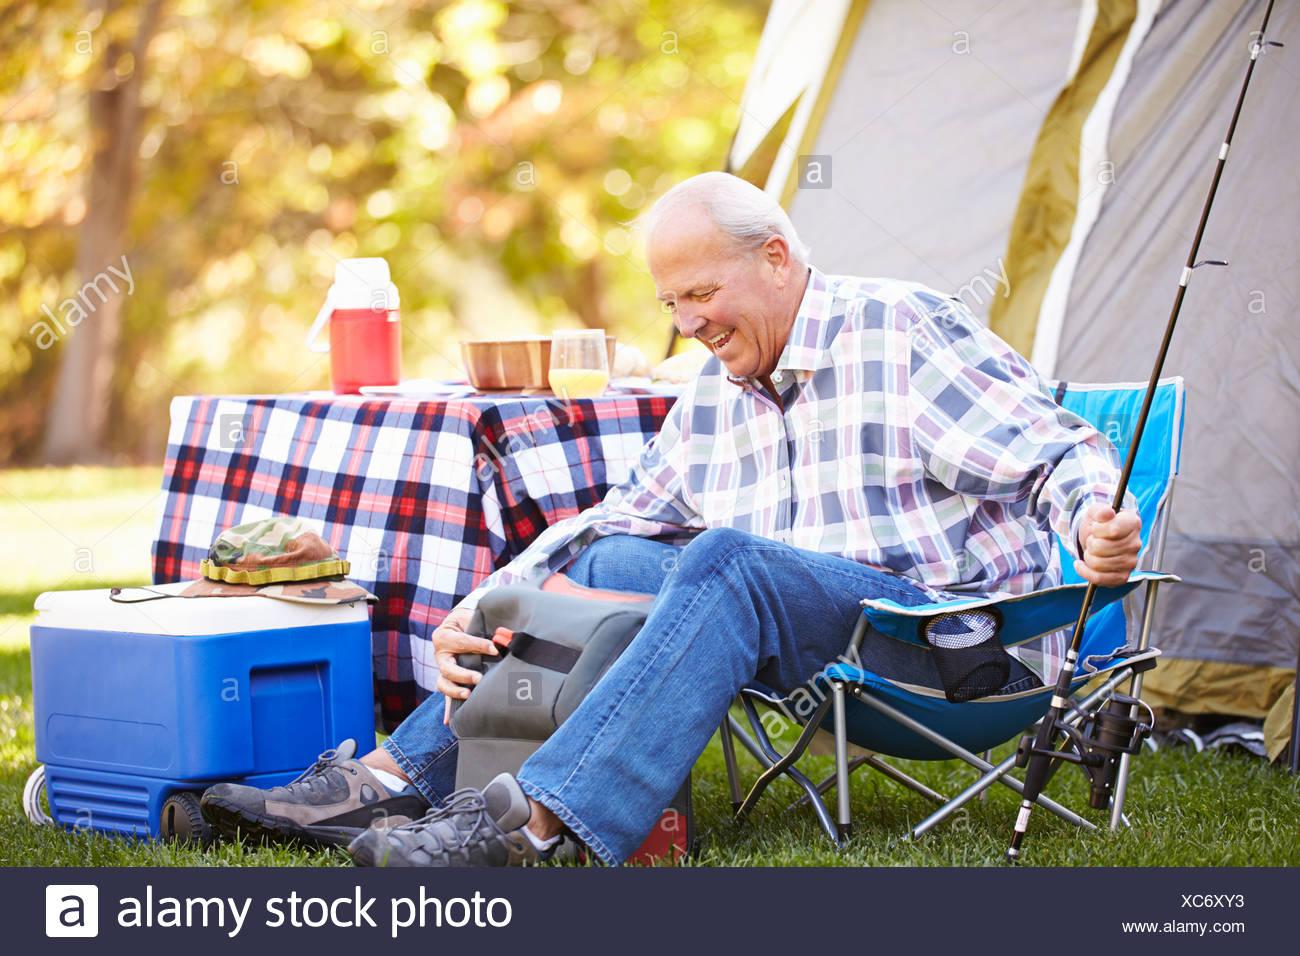 Senior Man On Camping Holiday With Fishing Rod - Stock Image